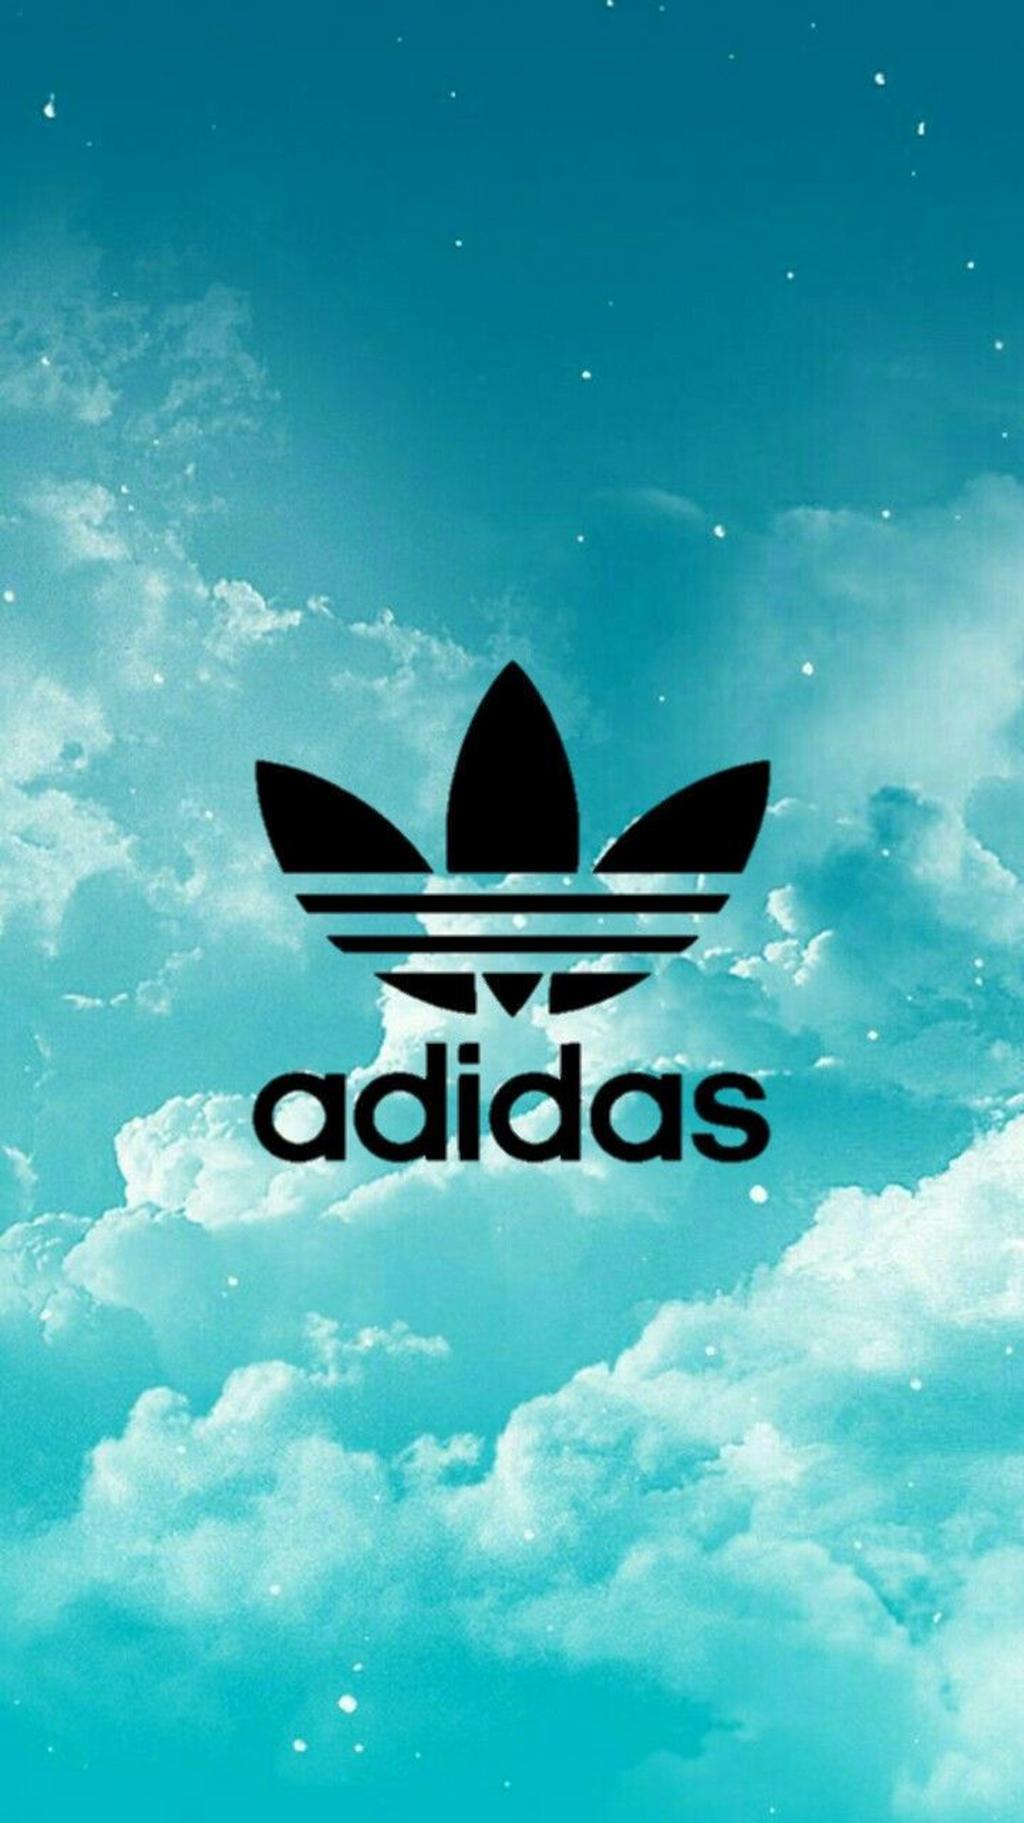 Adidas Wallpaper Iphone Adidas Backgrounds Sport Nike